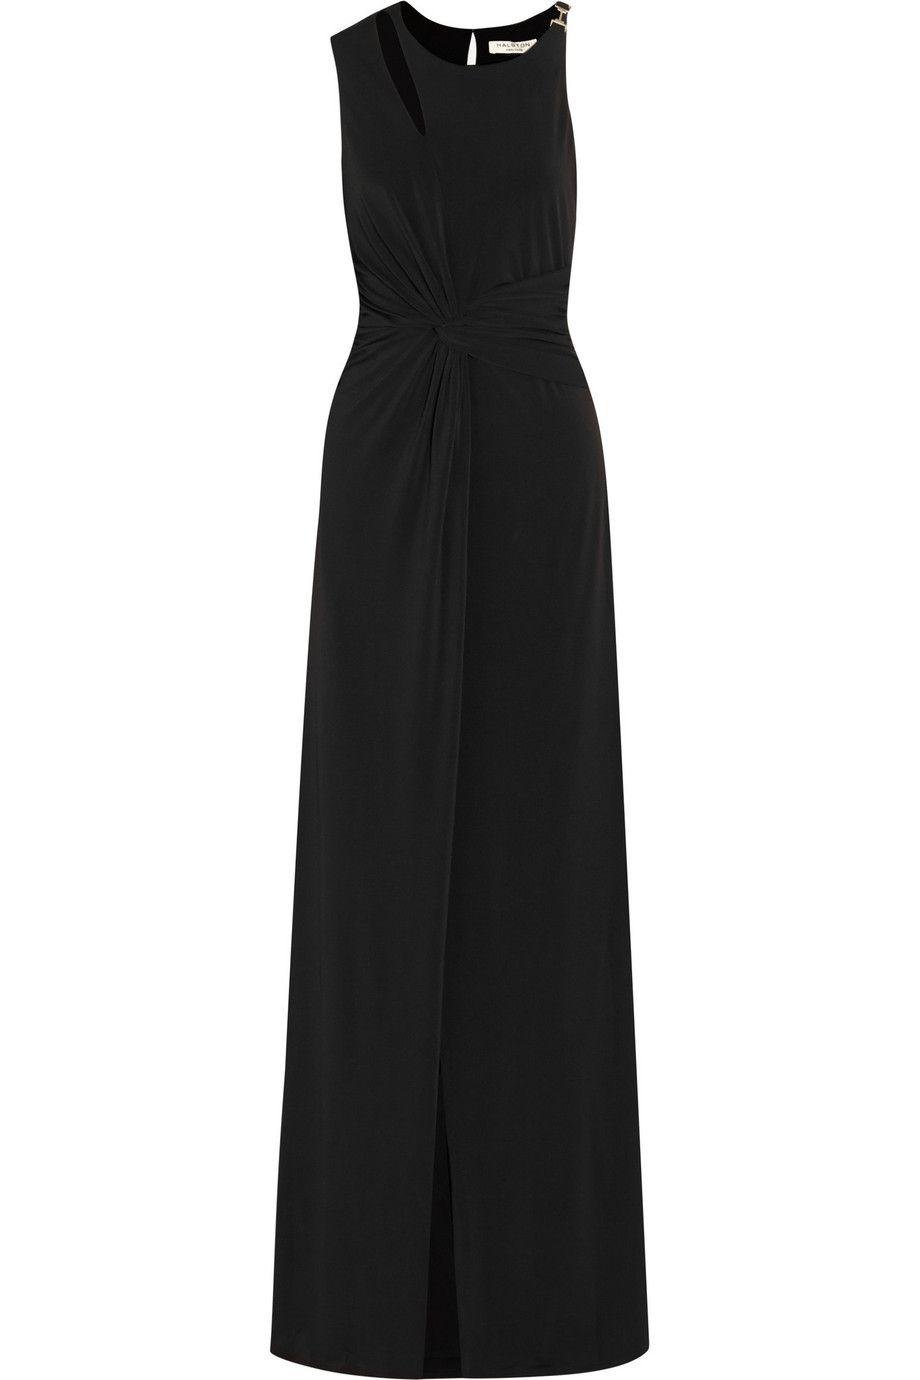 HALSTON HERITAGE Cutout Stretch-Jersey Gown. #halstonheritage #cloth ...